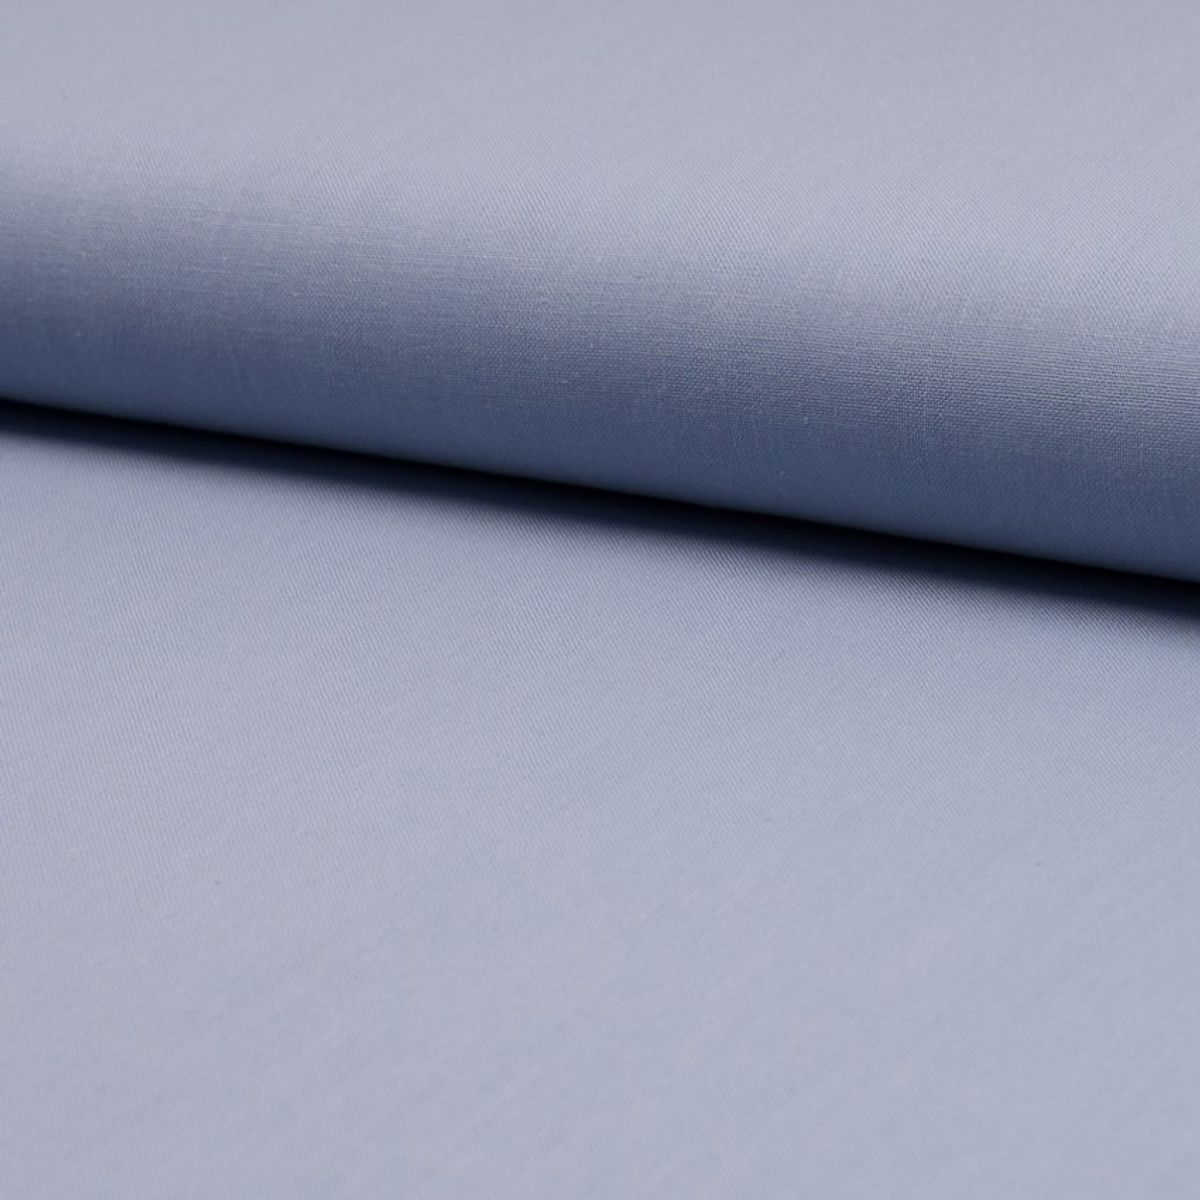 Tissu coton uni - Bleu gris